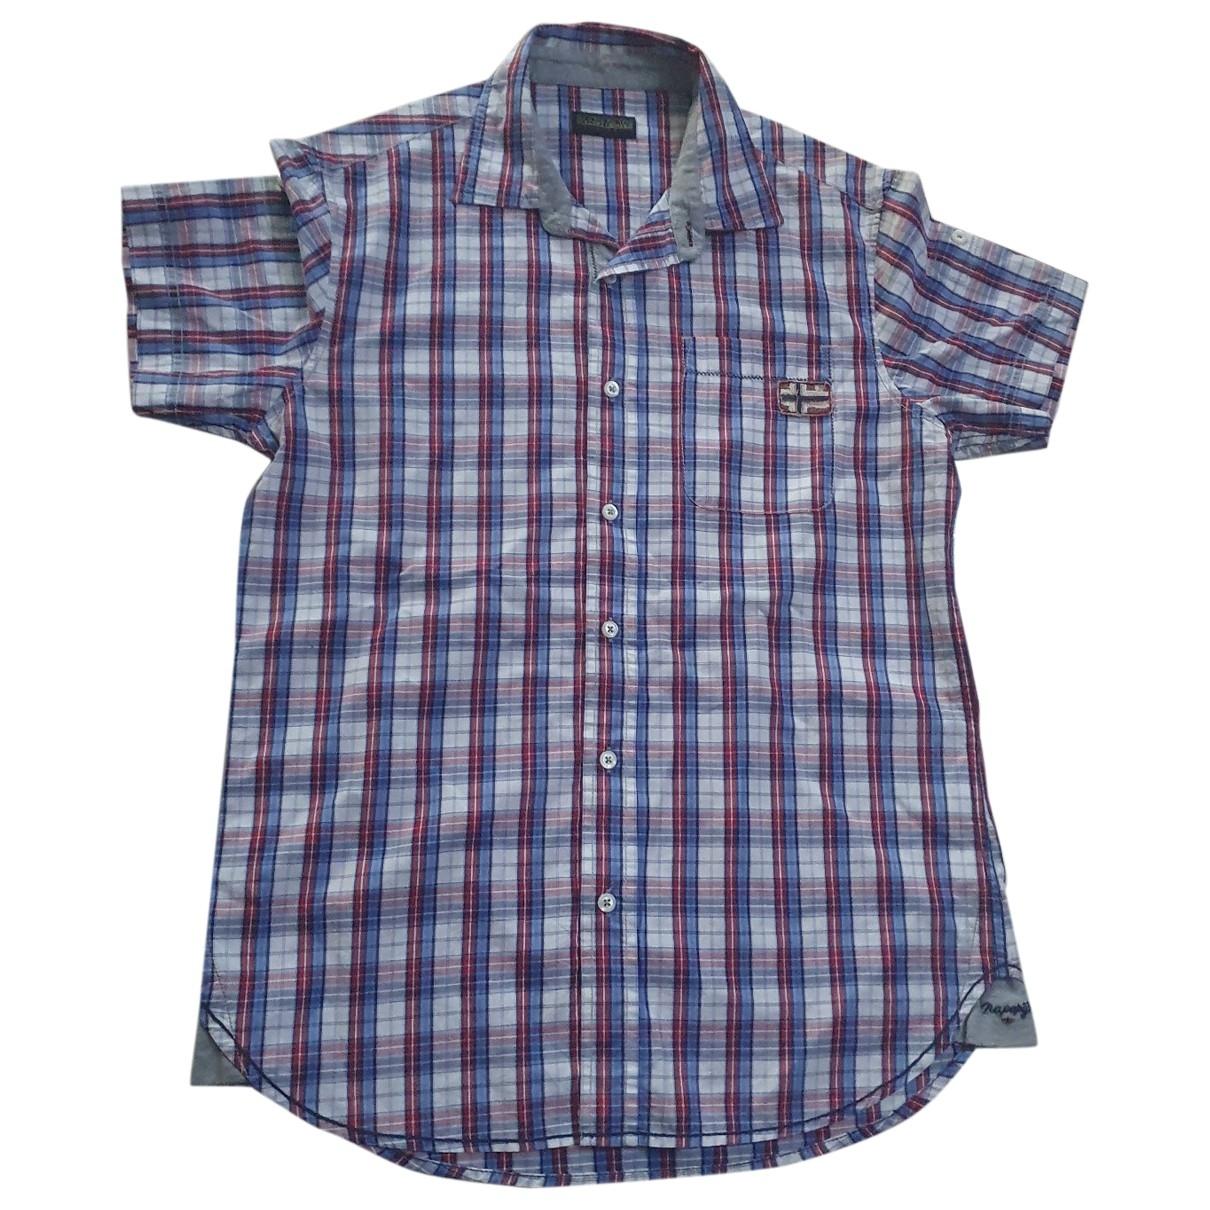 Napapijri \N Multicolour Cotton Shirts for Men M International